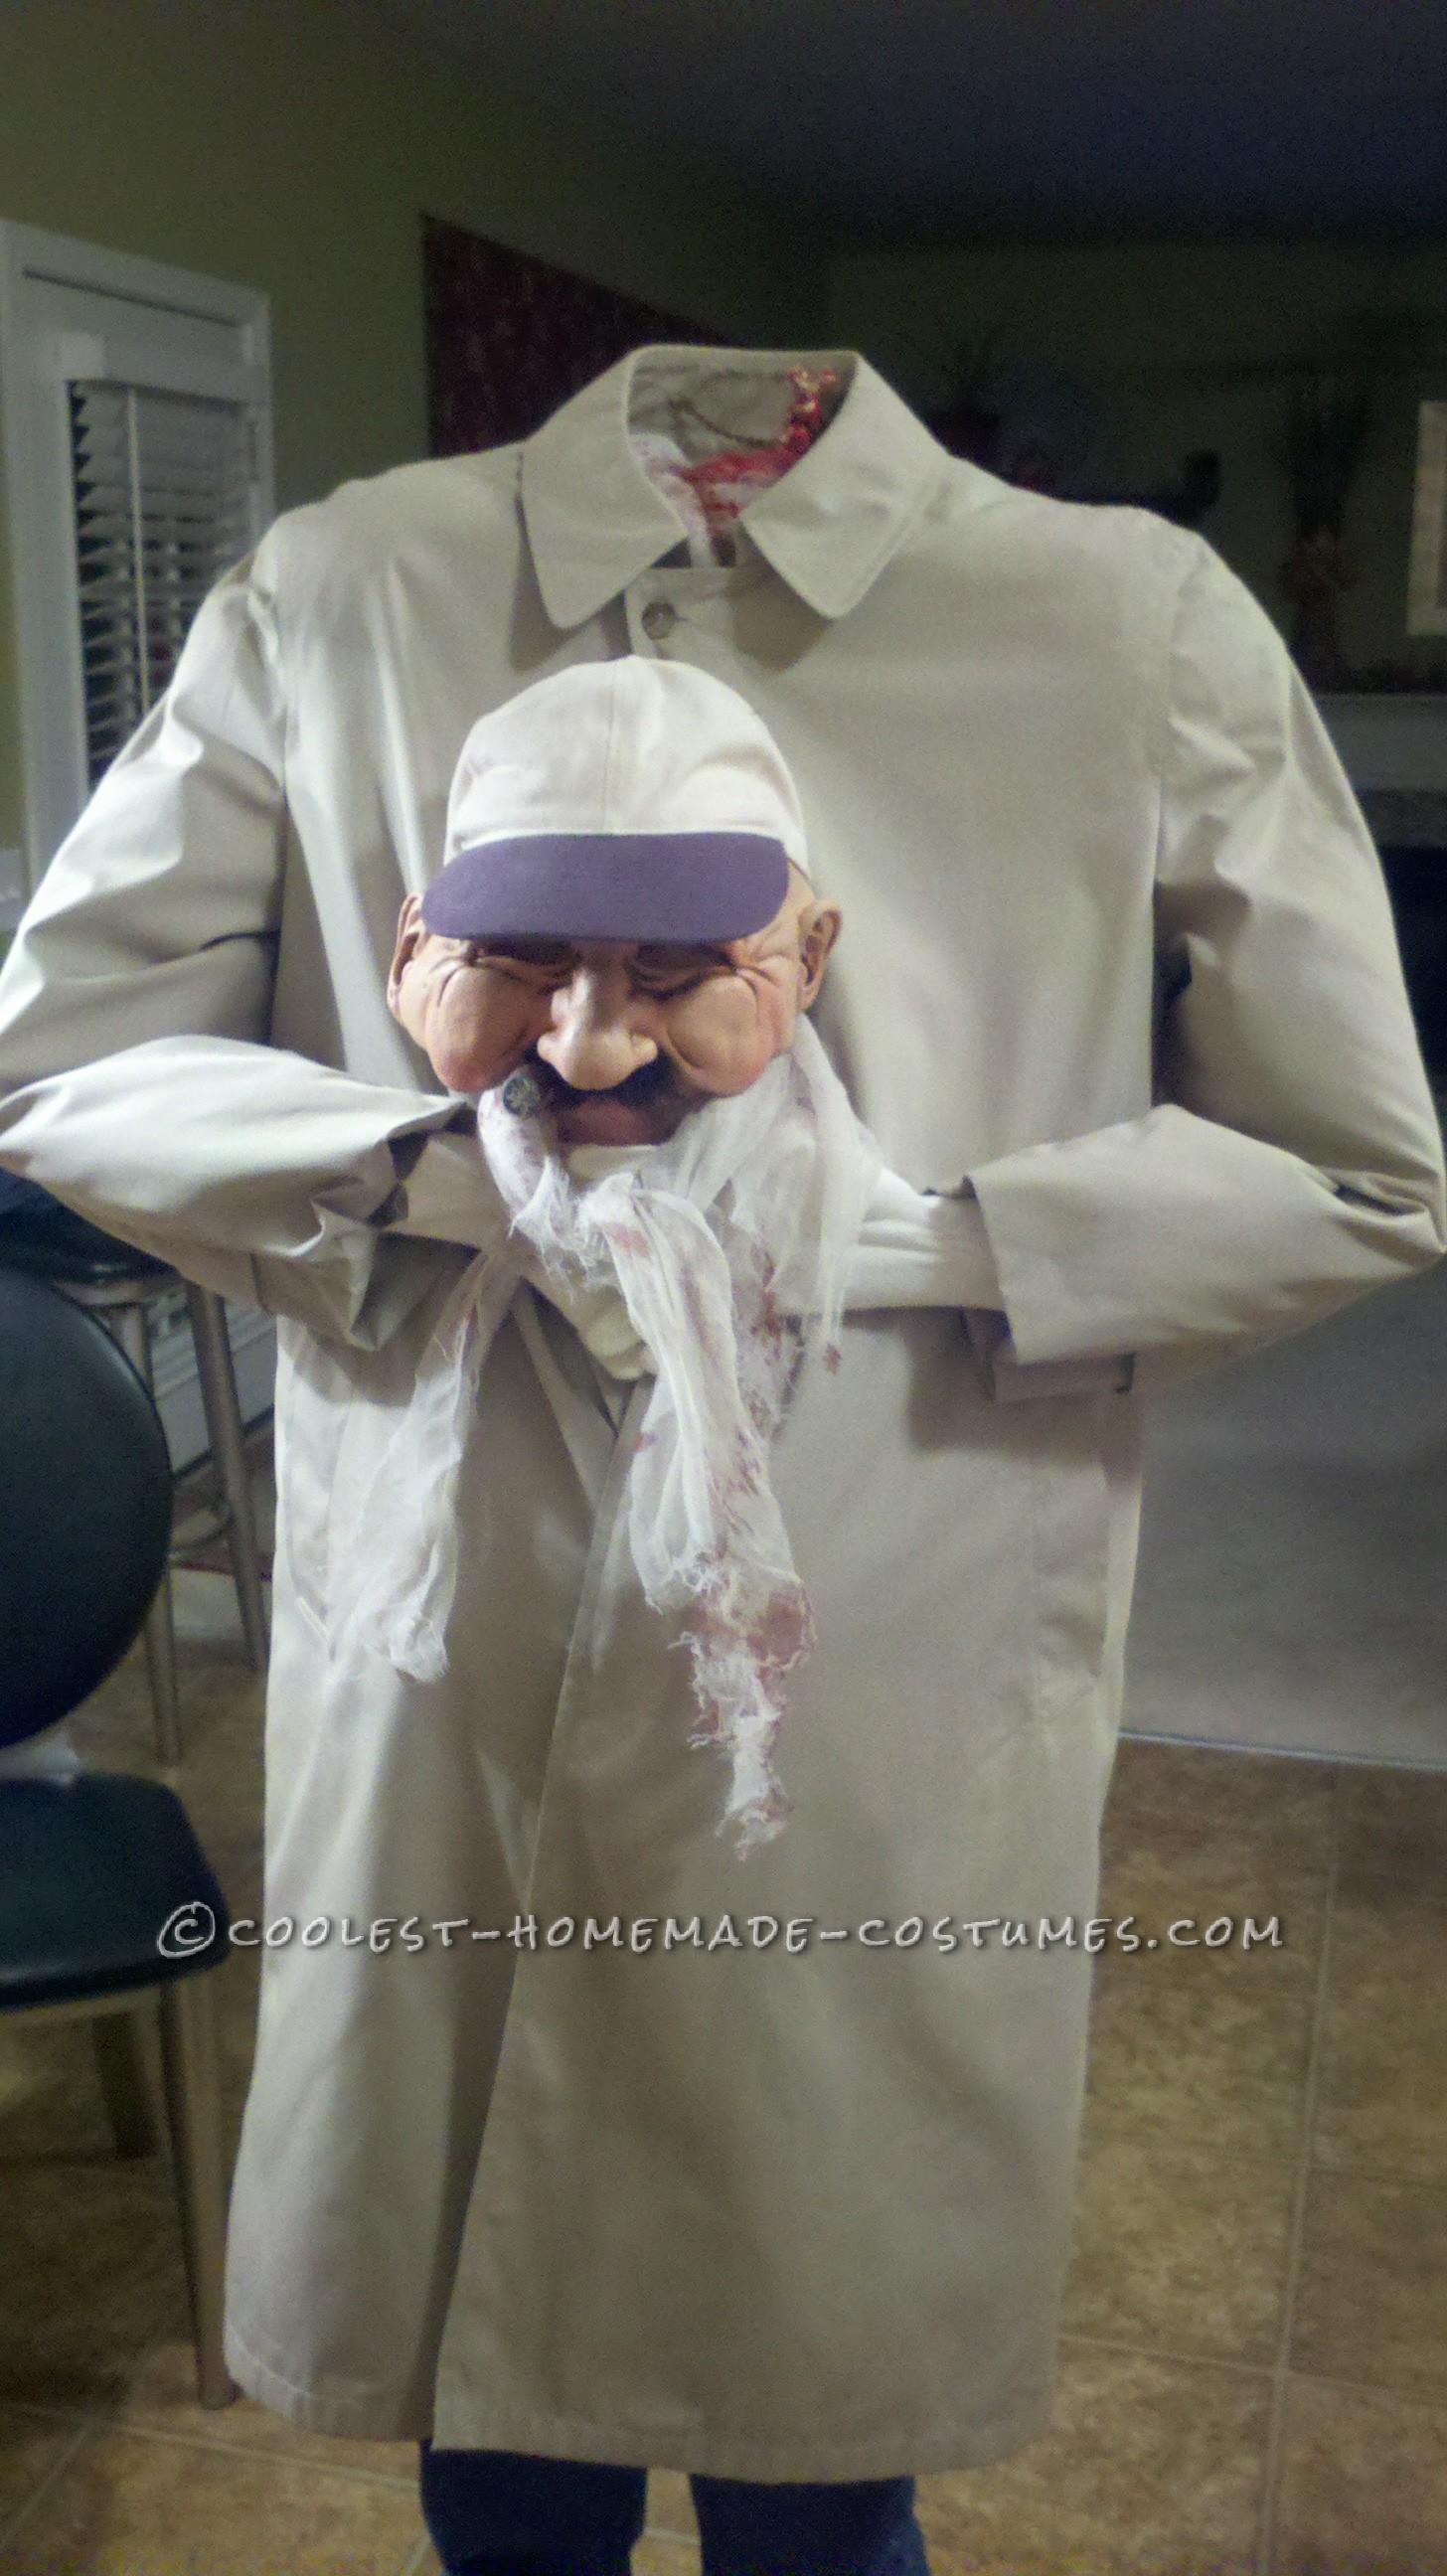 Headless Old Man Illusion Costume